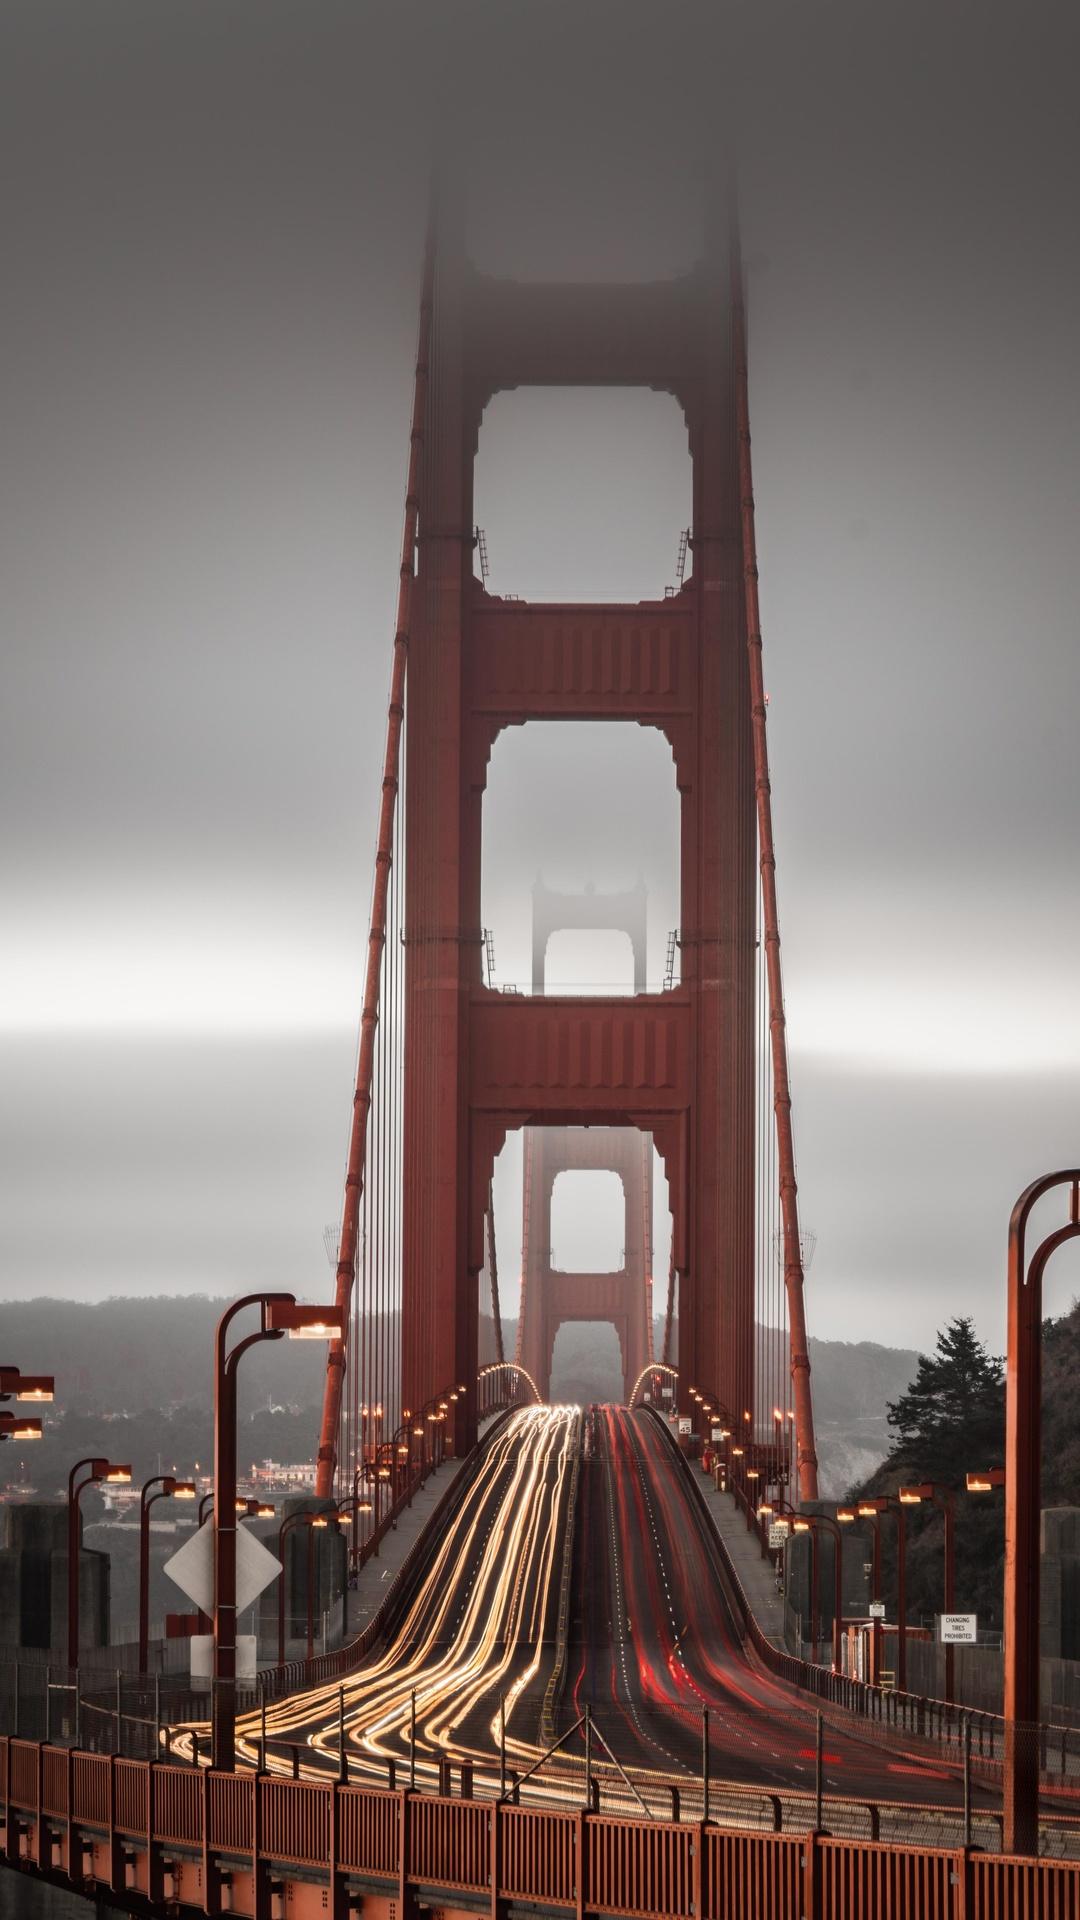 golden-gate-bridge-long-exposure-8k-wp.jpg